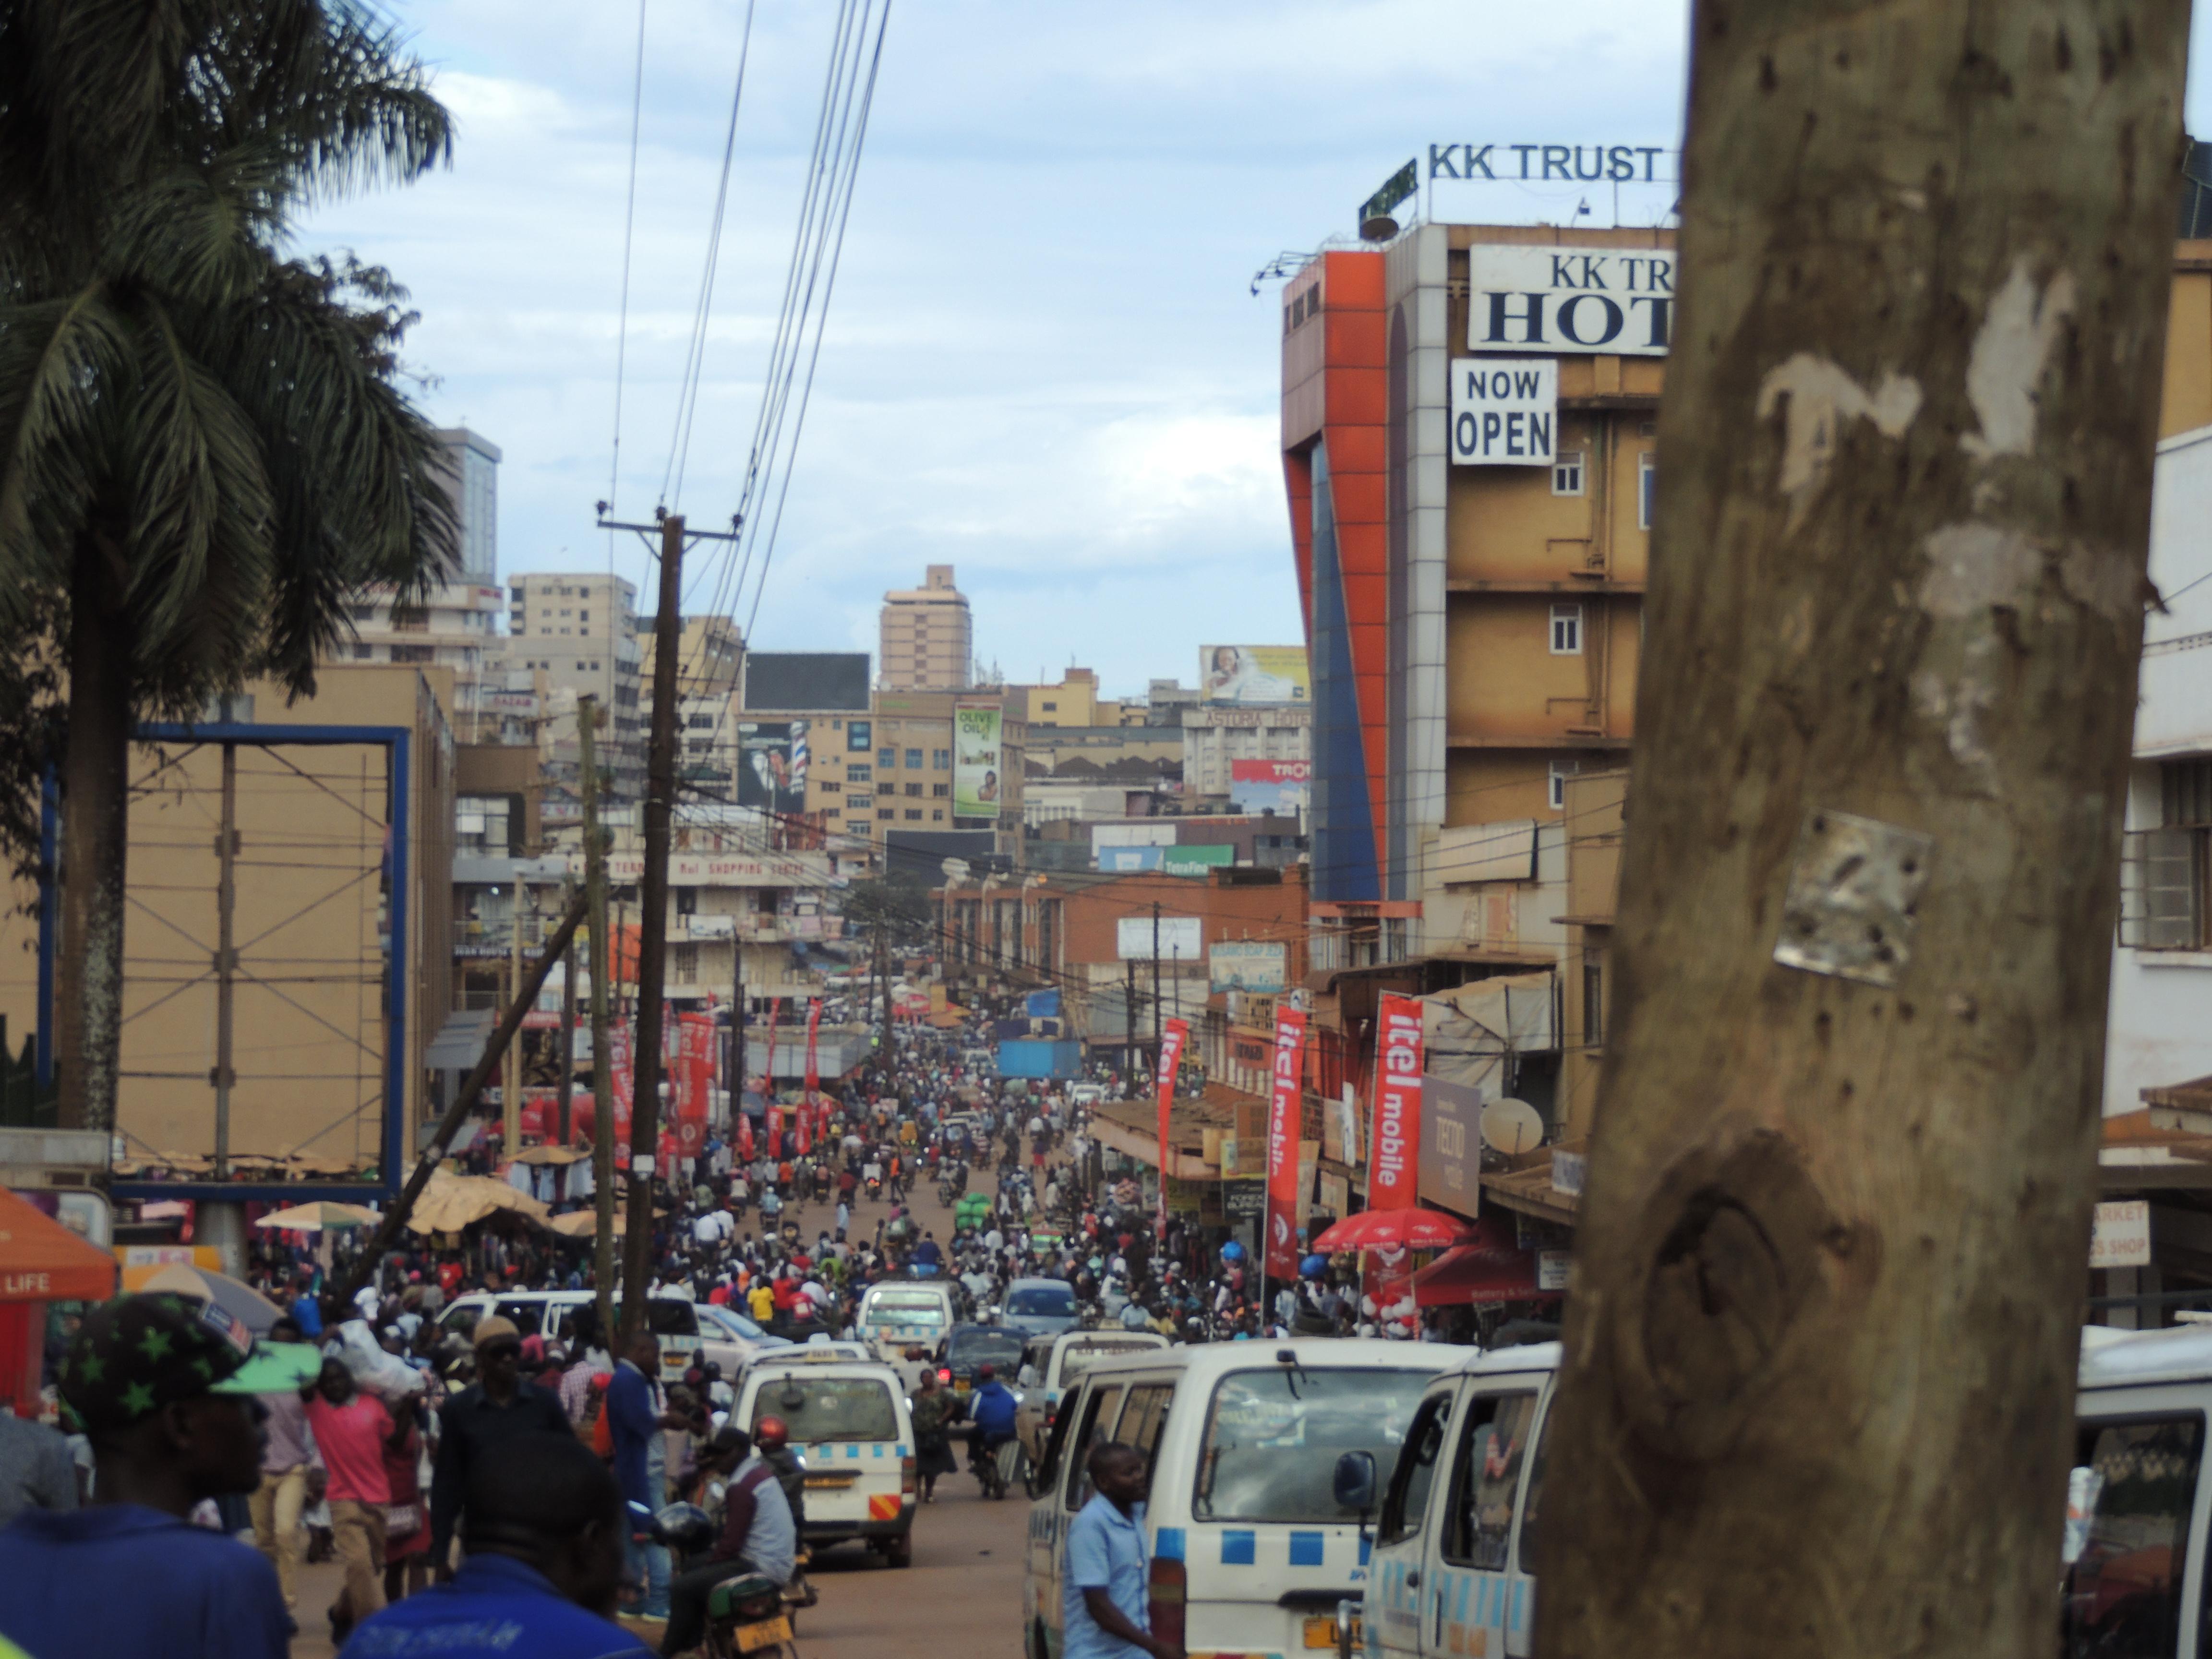 Namirembe Rd, Kampala - Howard Cambridge